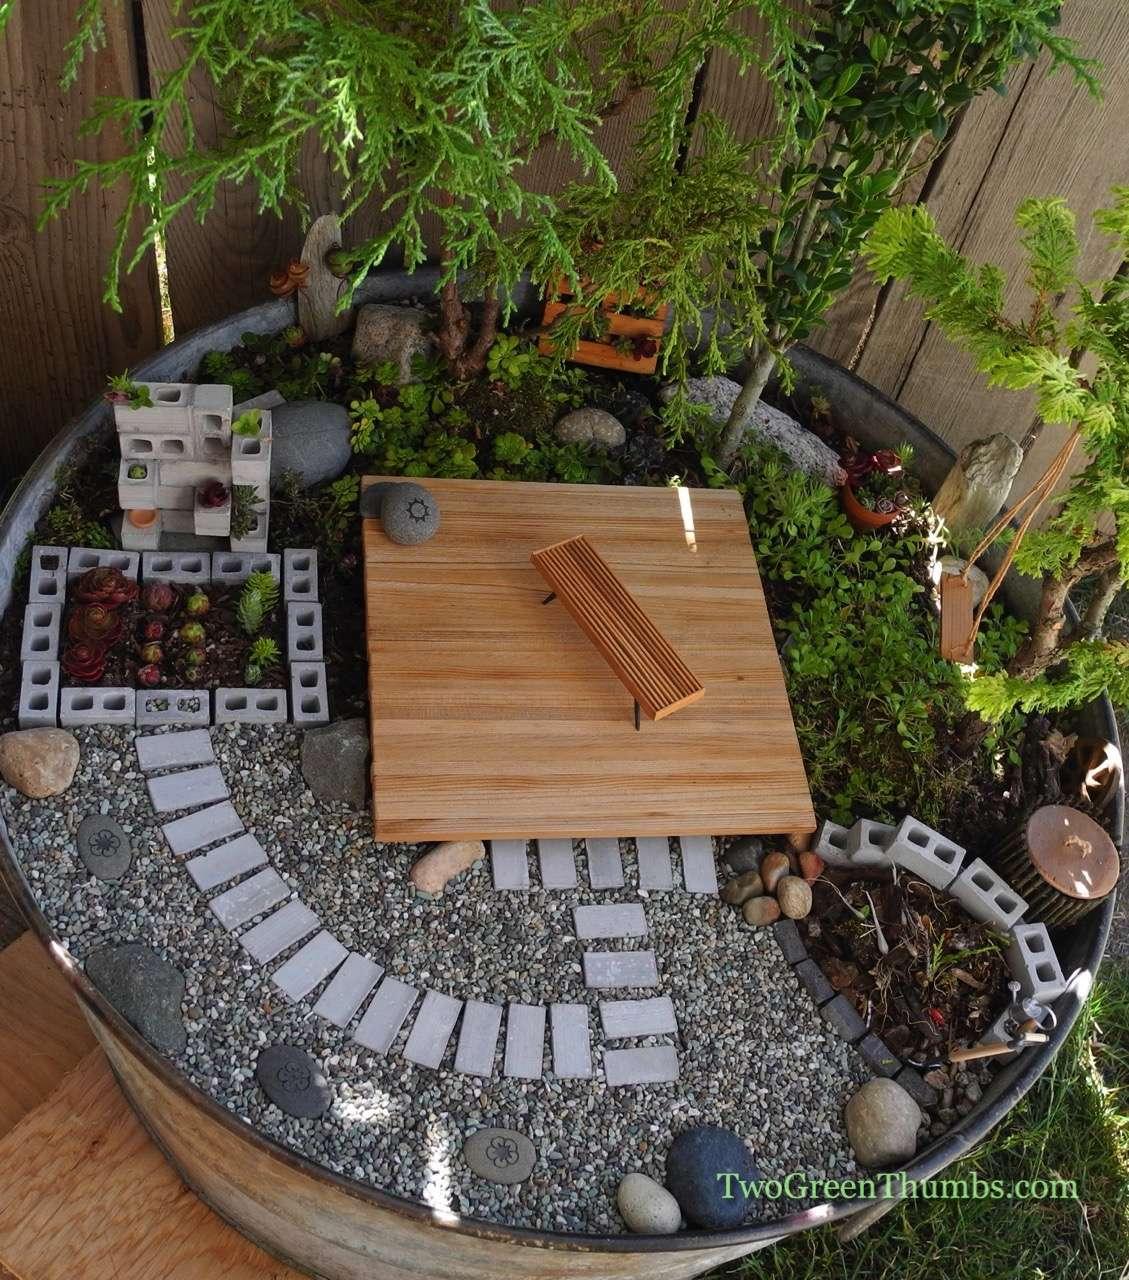 Blog | MiniatureGarden.com for Everything Gardening in Miniature!